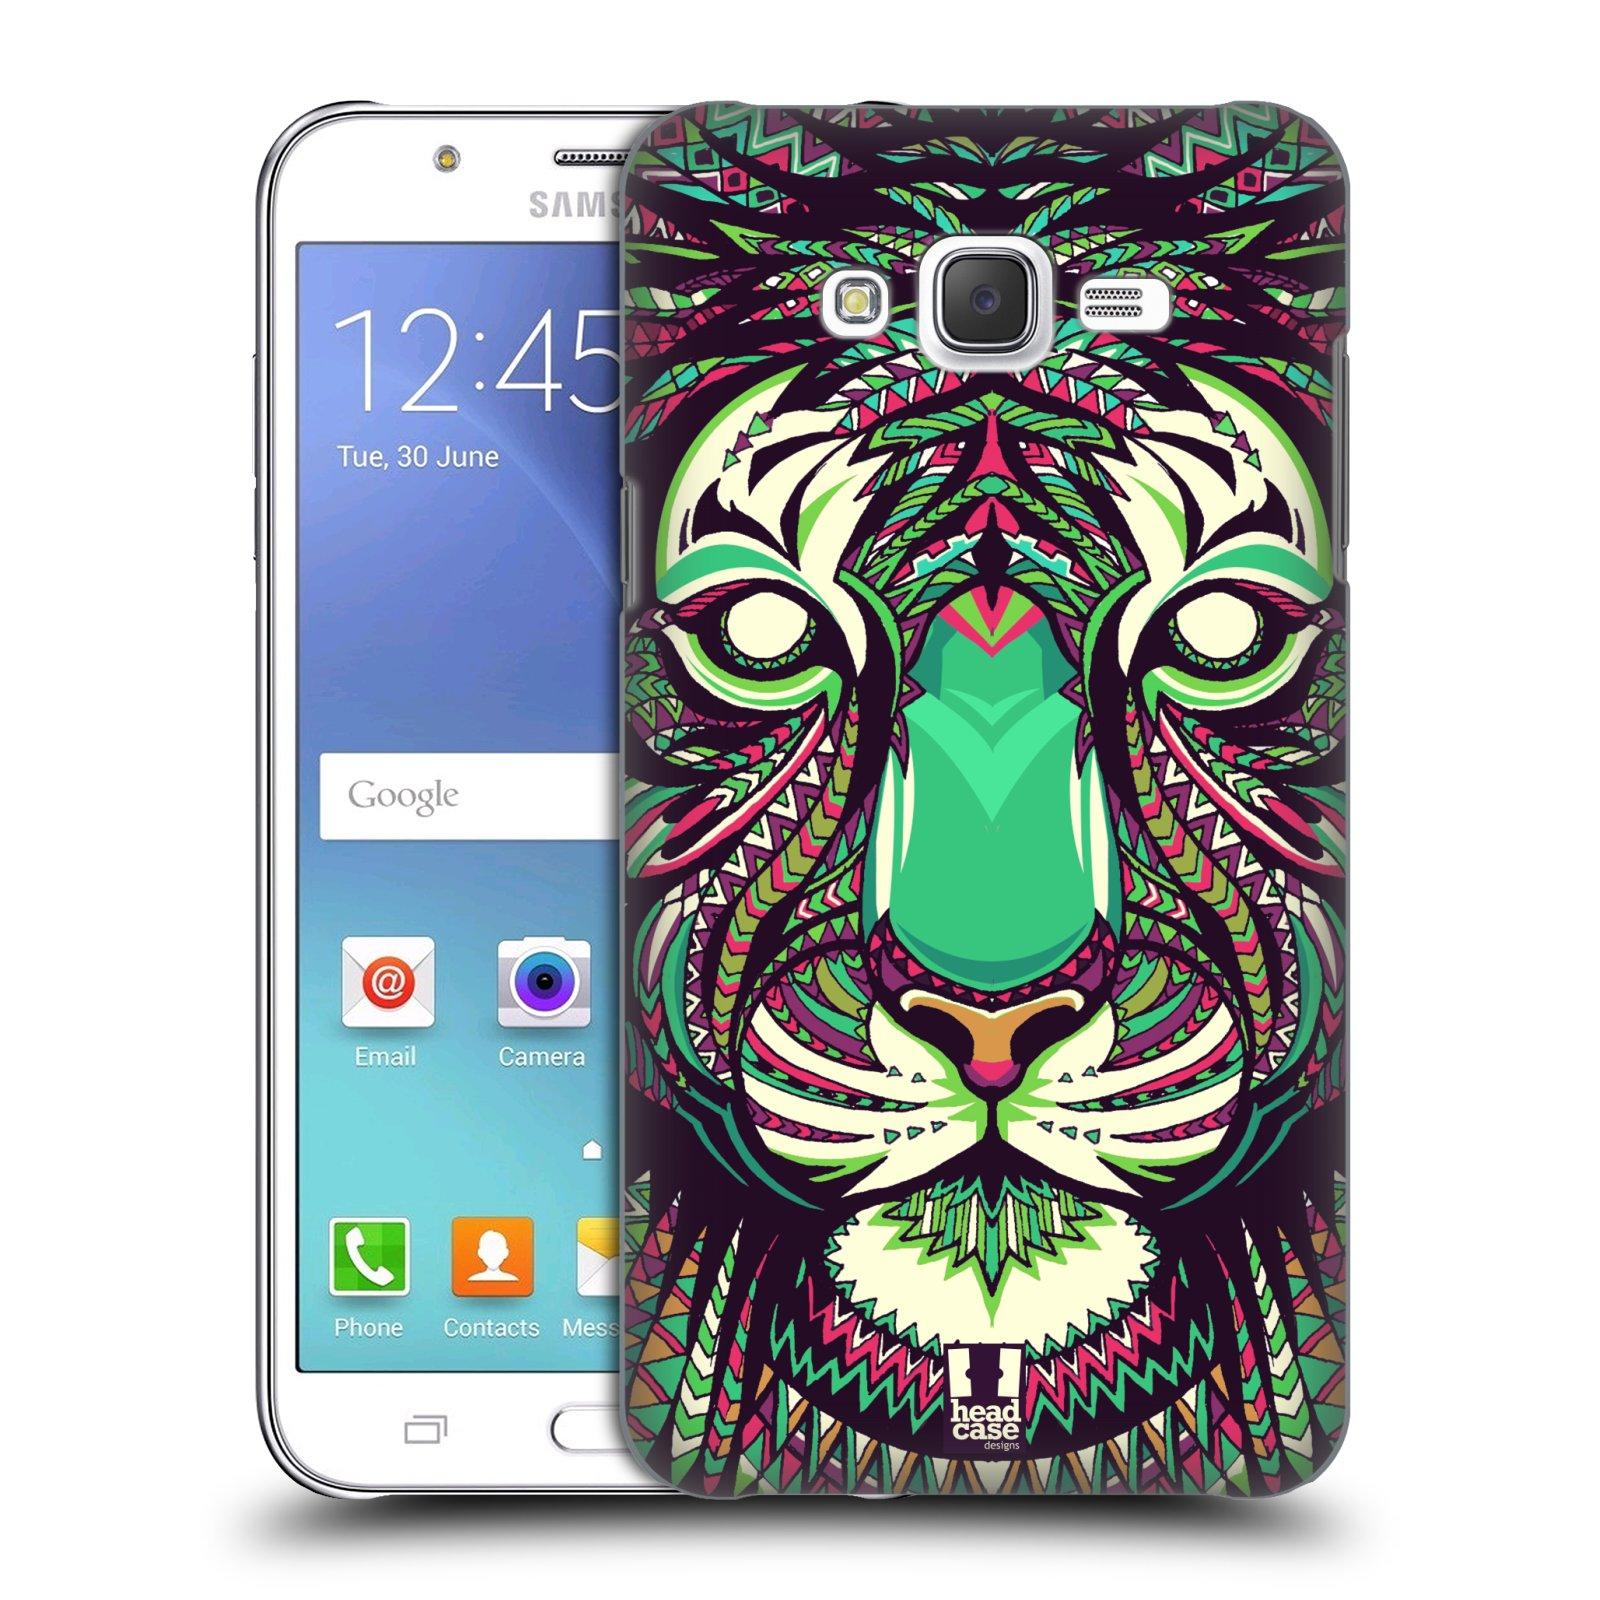 HEAD CASE plastový obal na mobil SAMSUNG Galaxy J7, J700 vzor Aztécký motiv zvíře 2 tygr